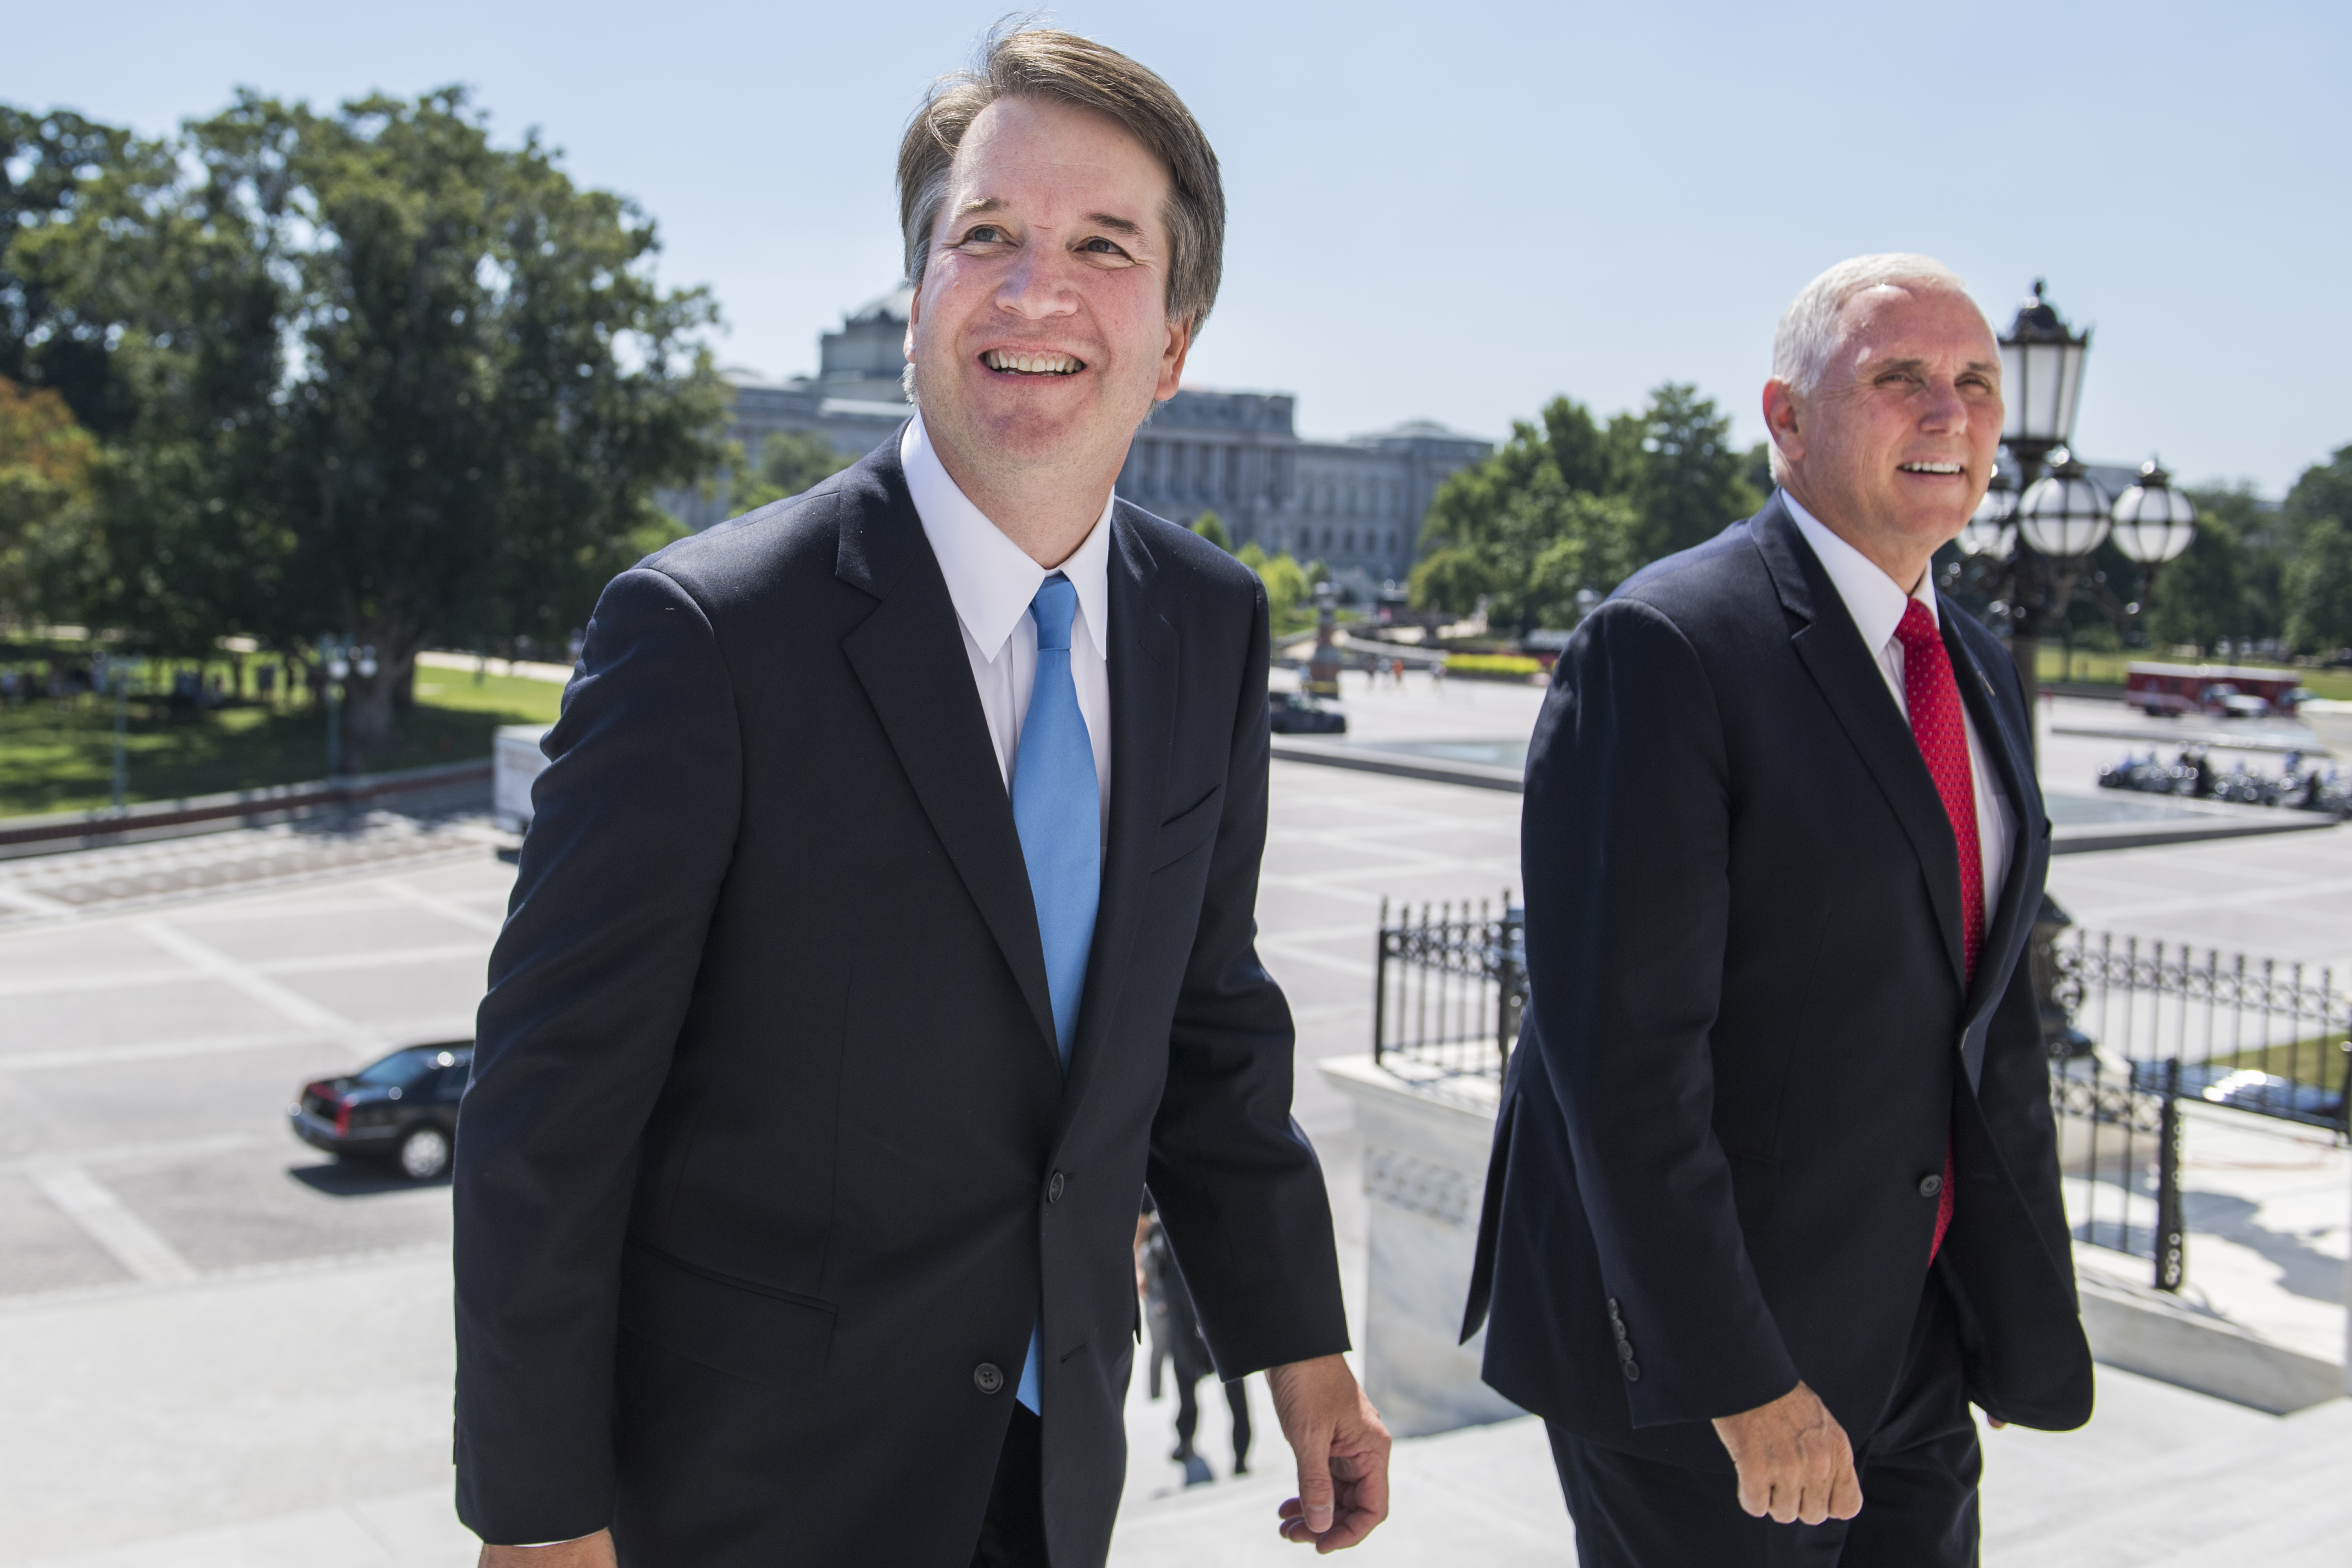 Brett Cavanaugh and Mike Pence